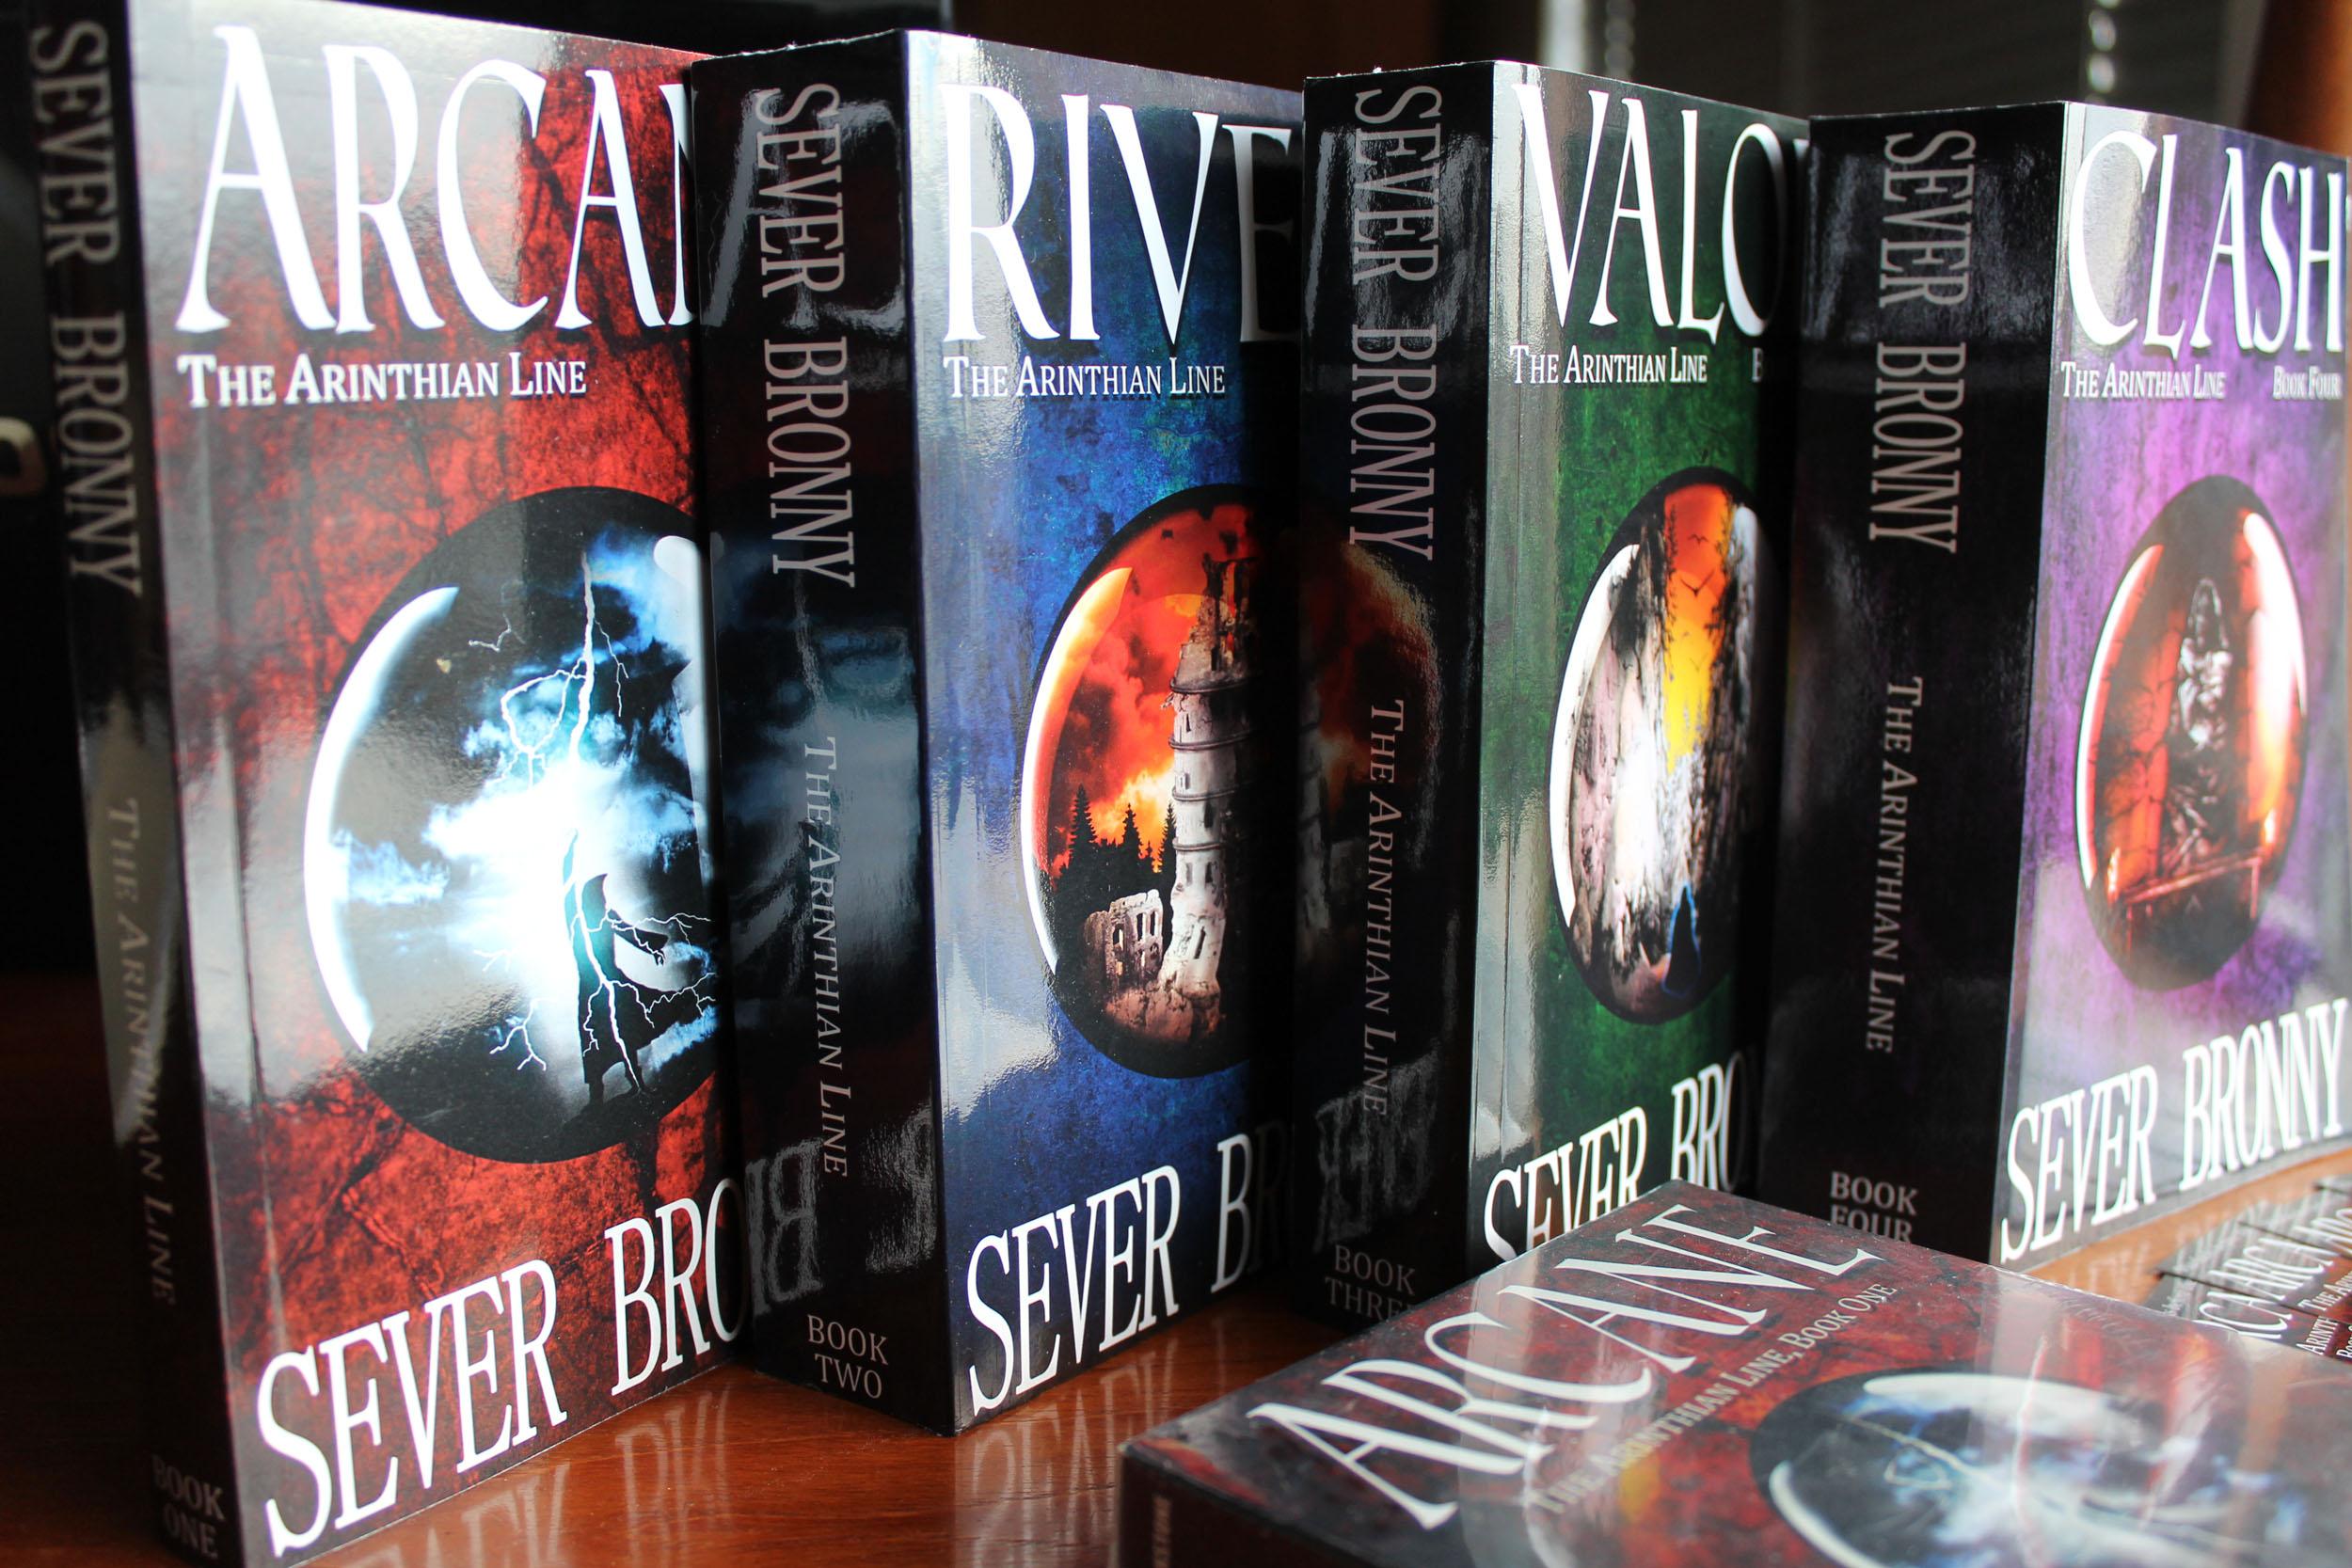 complete epic fantasy series